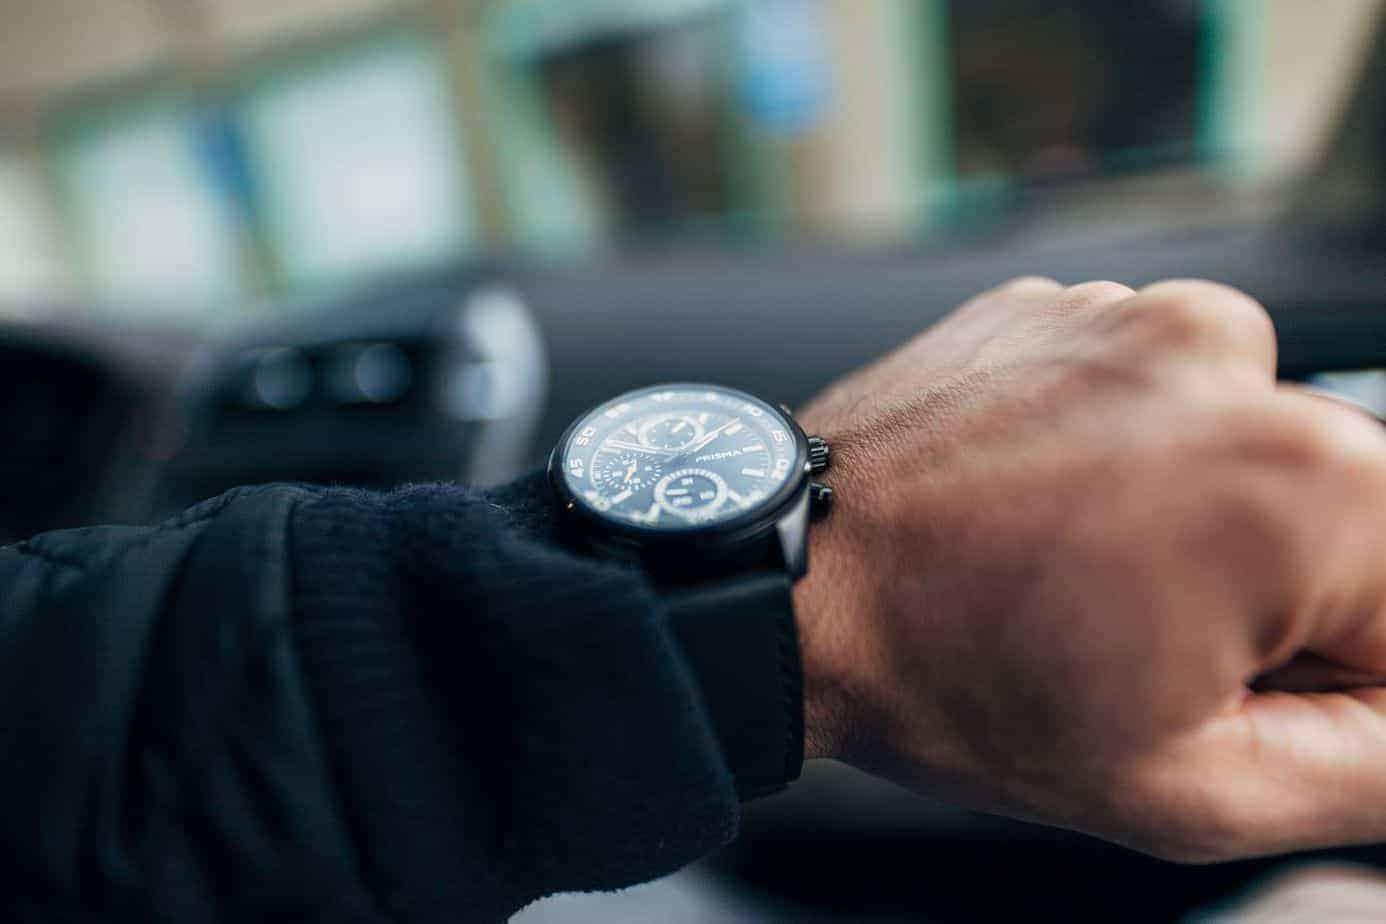 hoe horloge dragen Prisma Aviator Edition herenhorloge herenhorloges horloges voor mannen